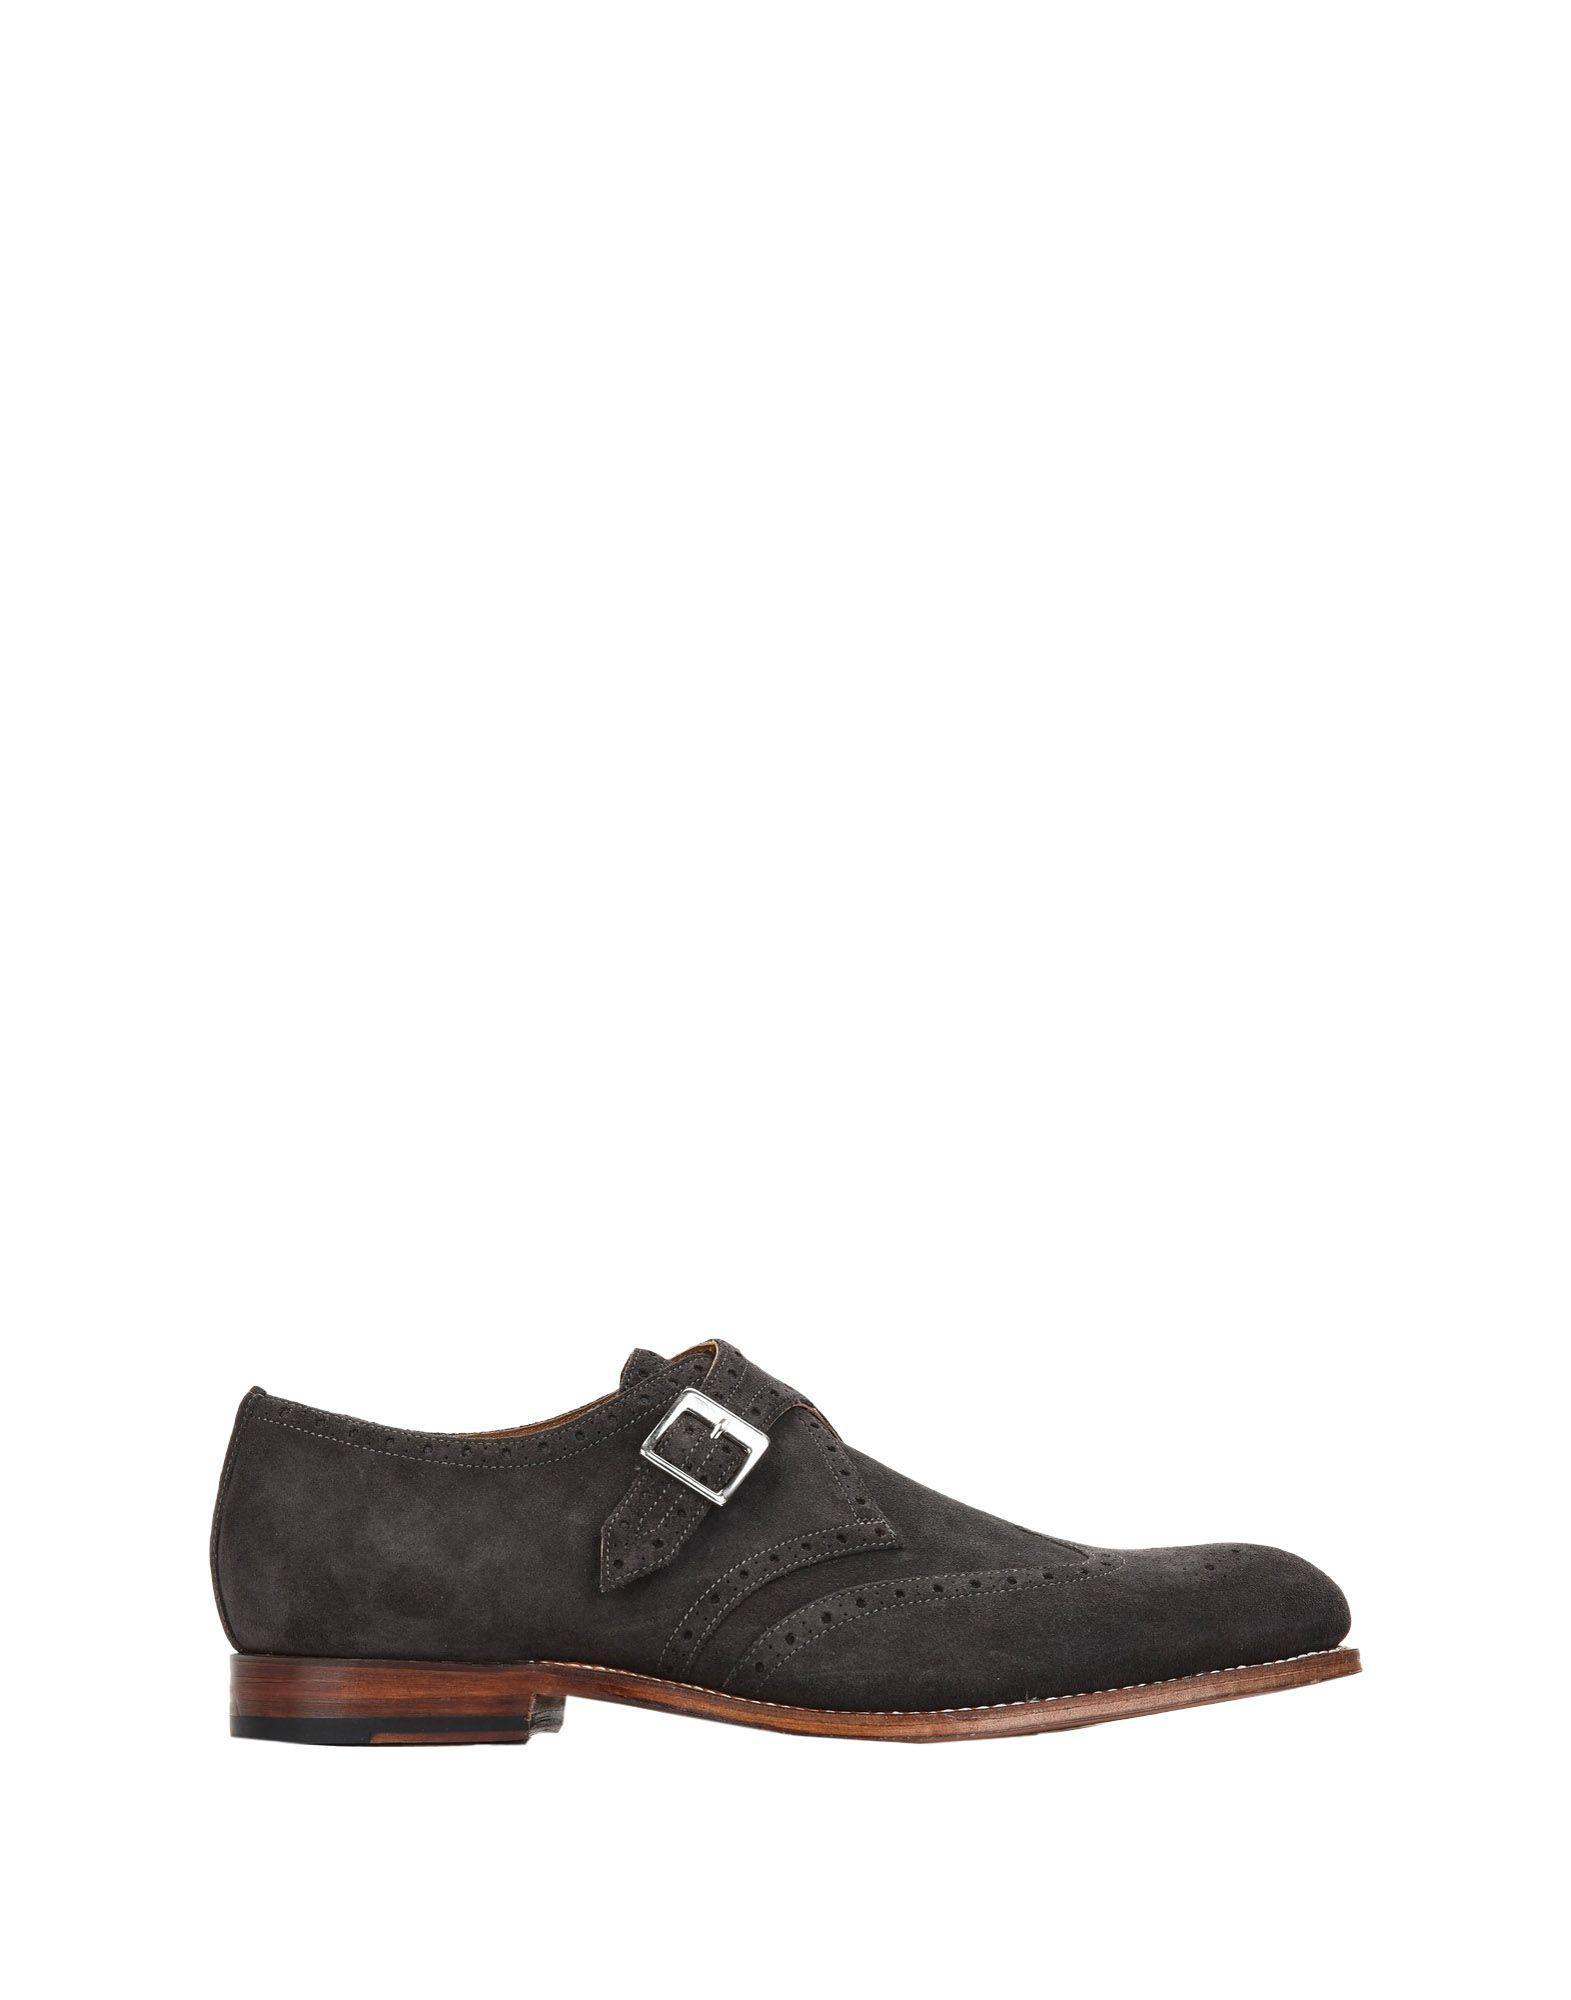 bb2cec4b7c8 Lyst - Grenson Loafer in Gray for Men